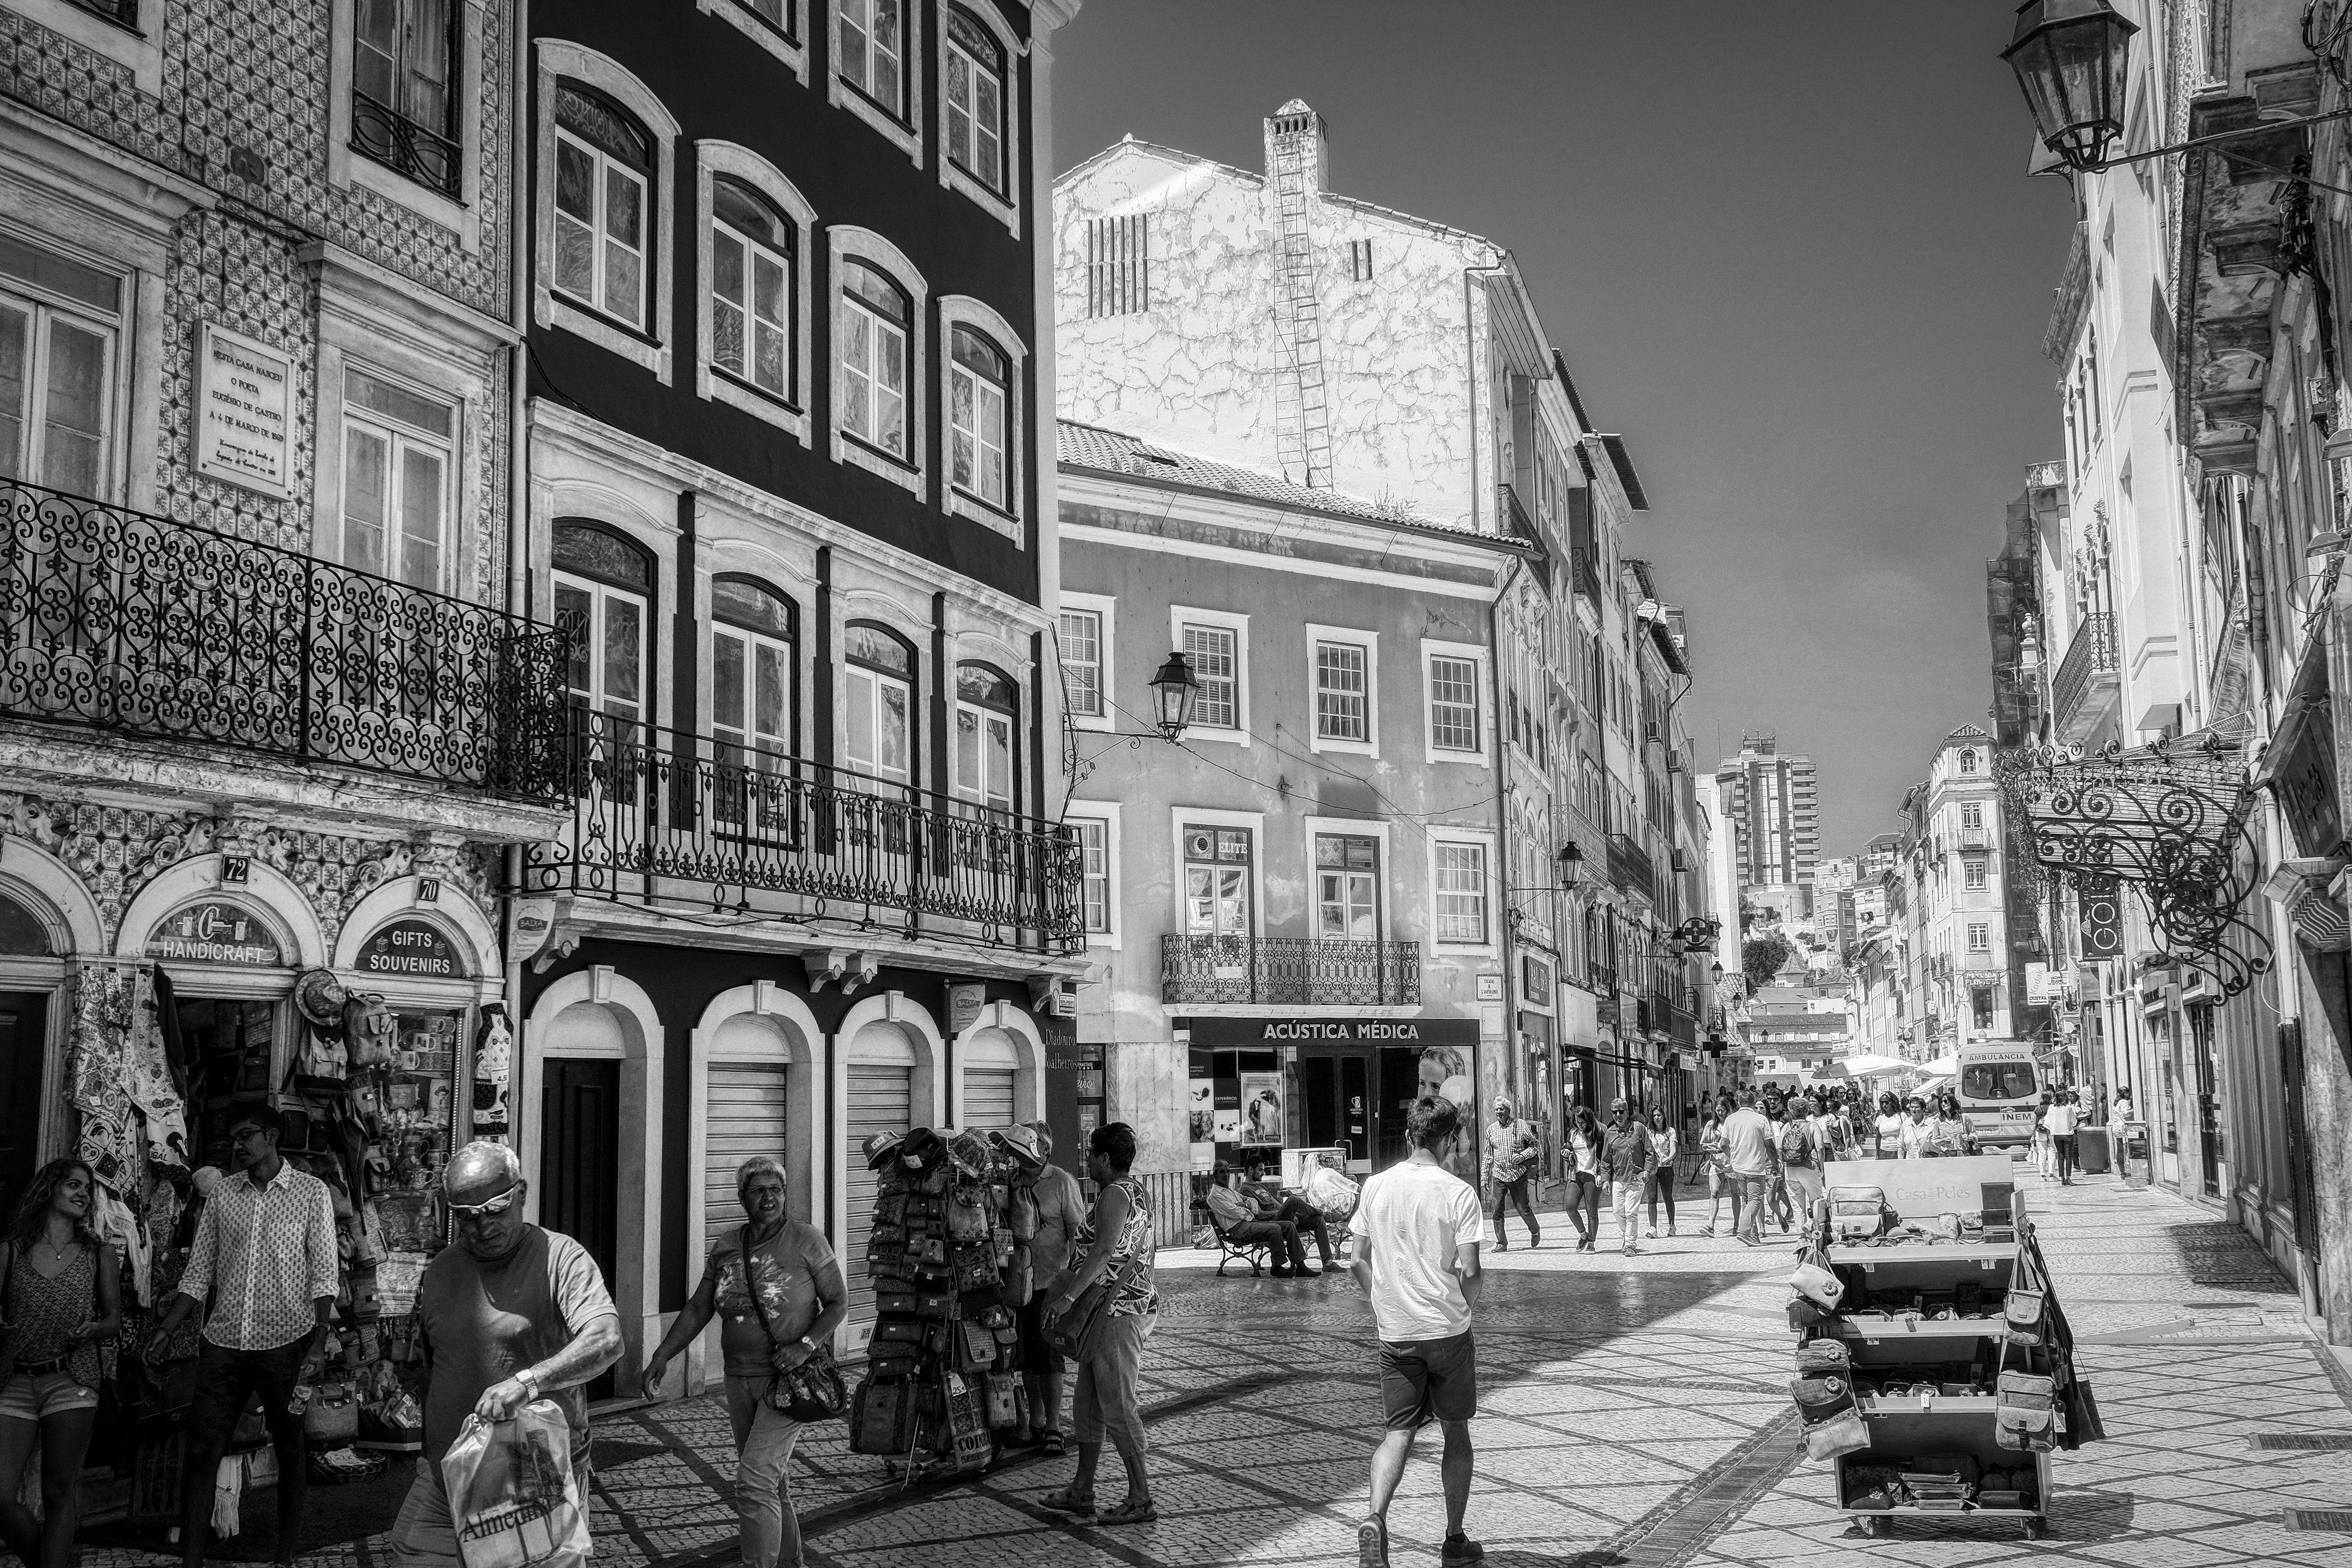 Duch Coimbra spazieren / strolling through Coimbra